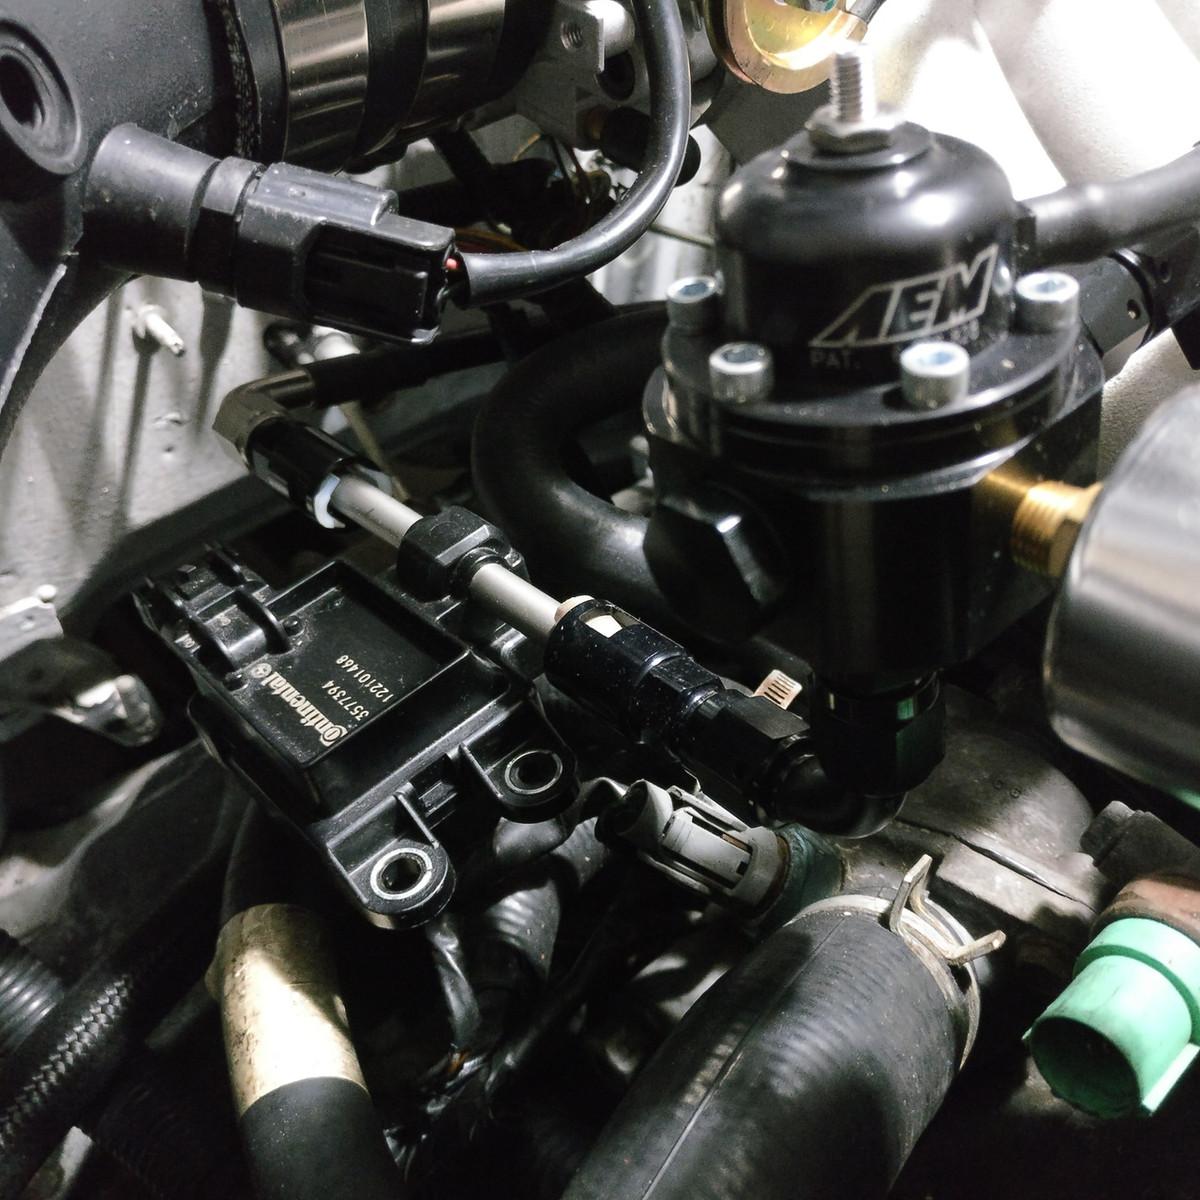 medium resolution of jbtuned flex fuel e85 fuel system conversion civic integra b d series